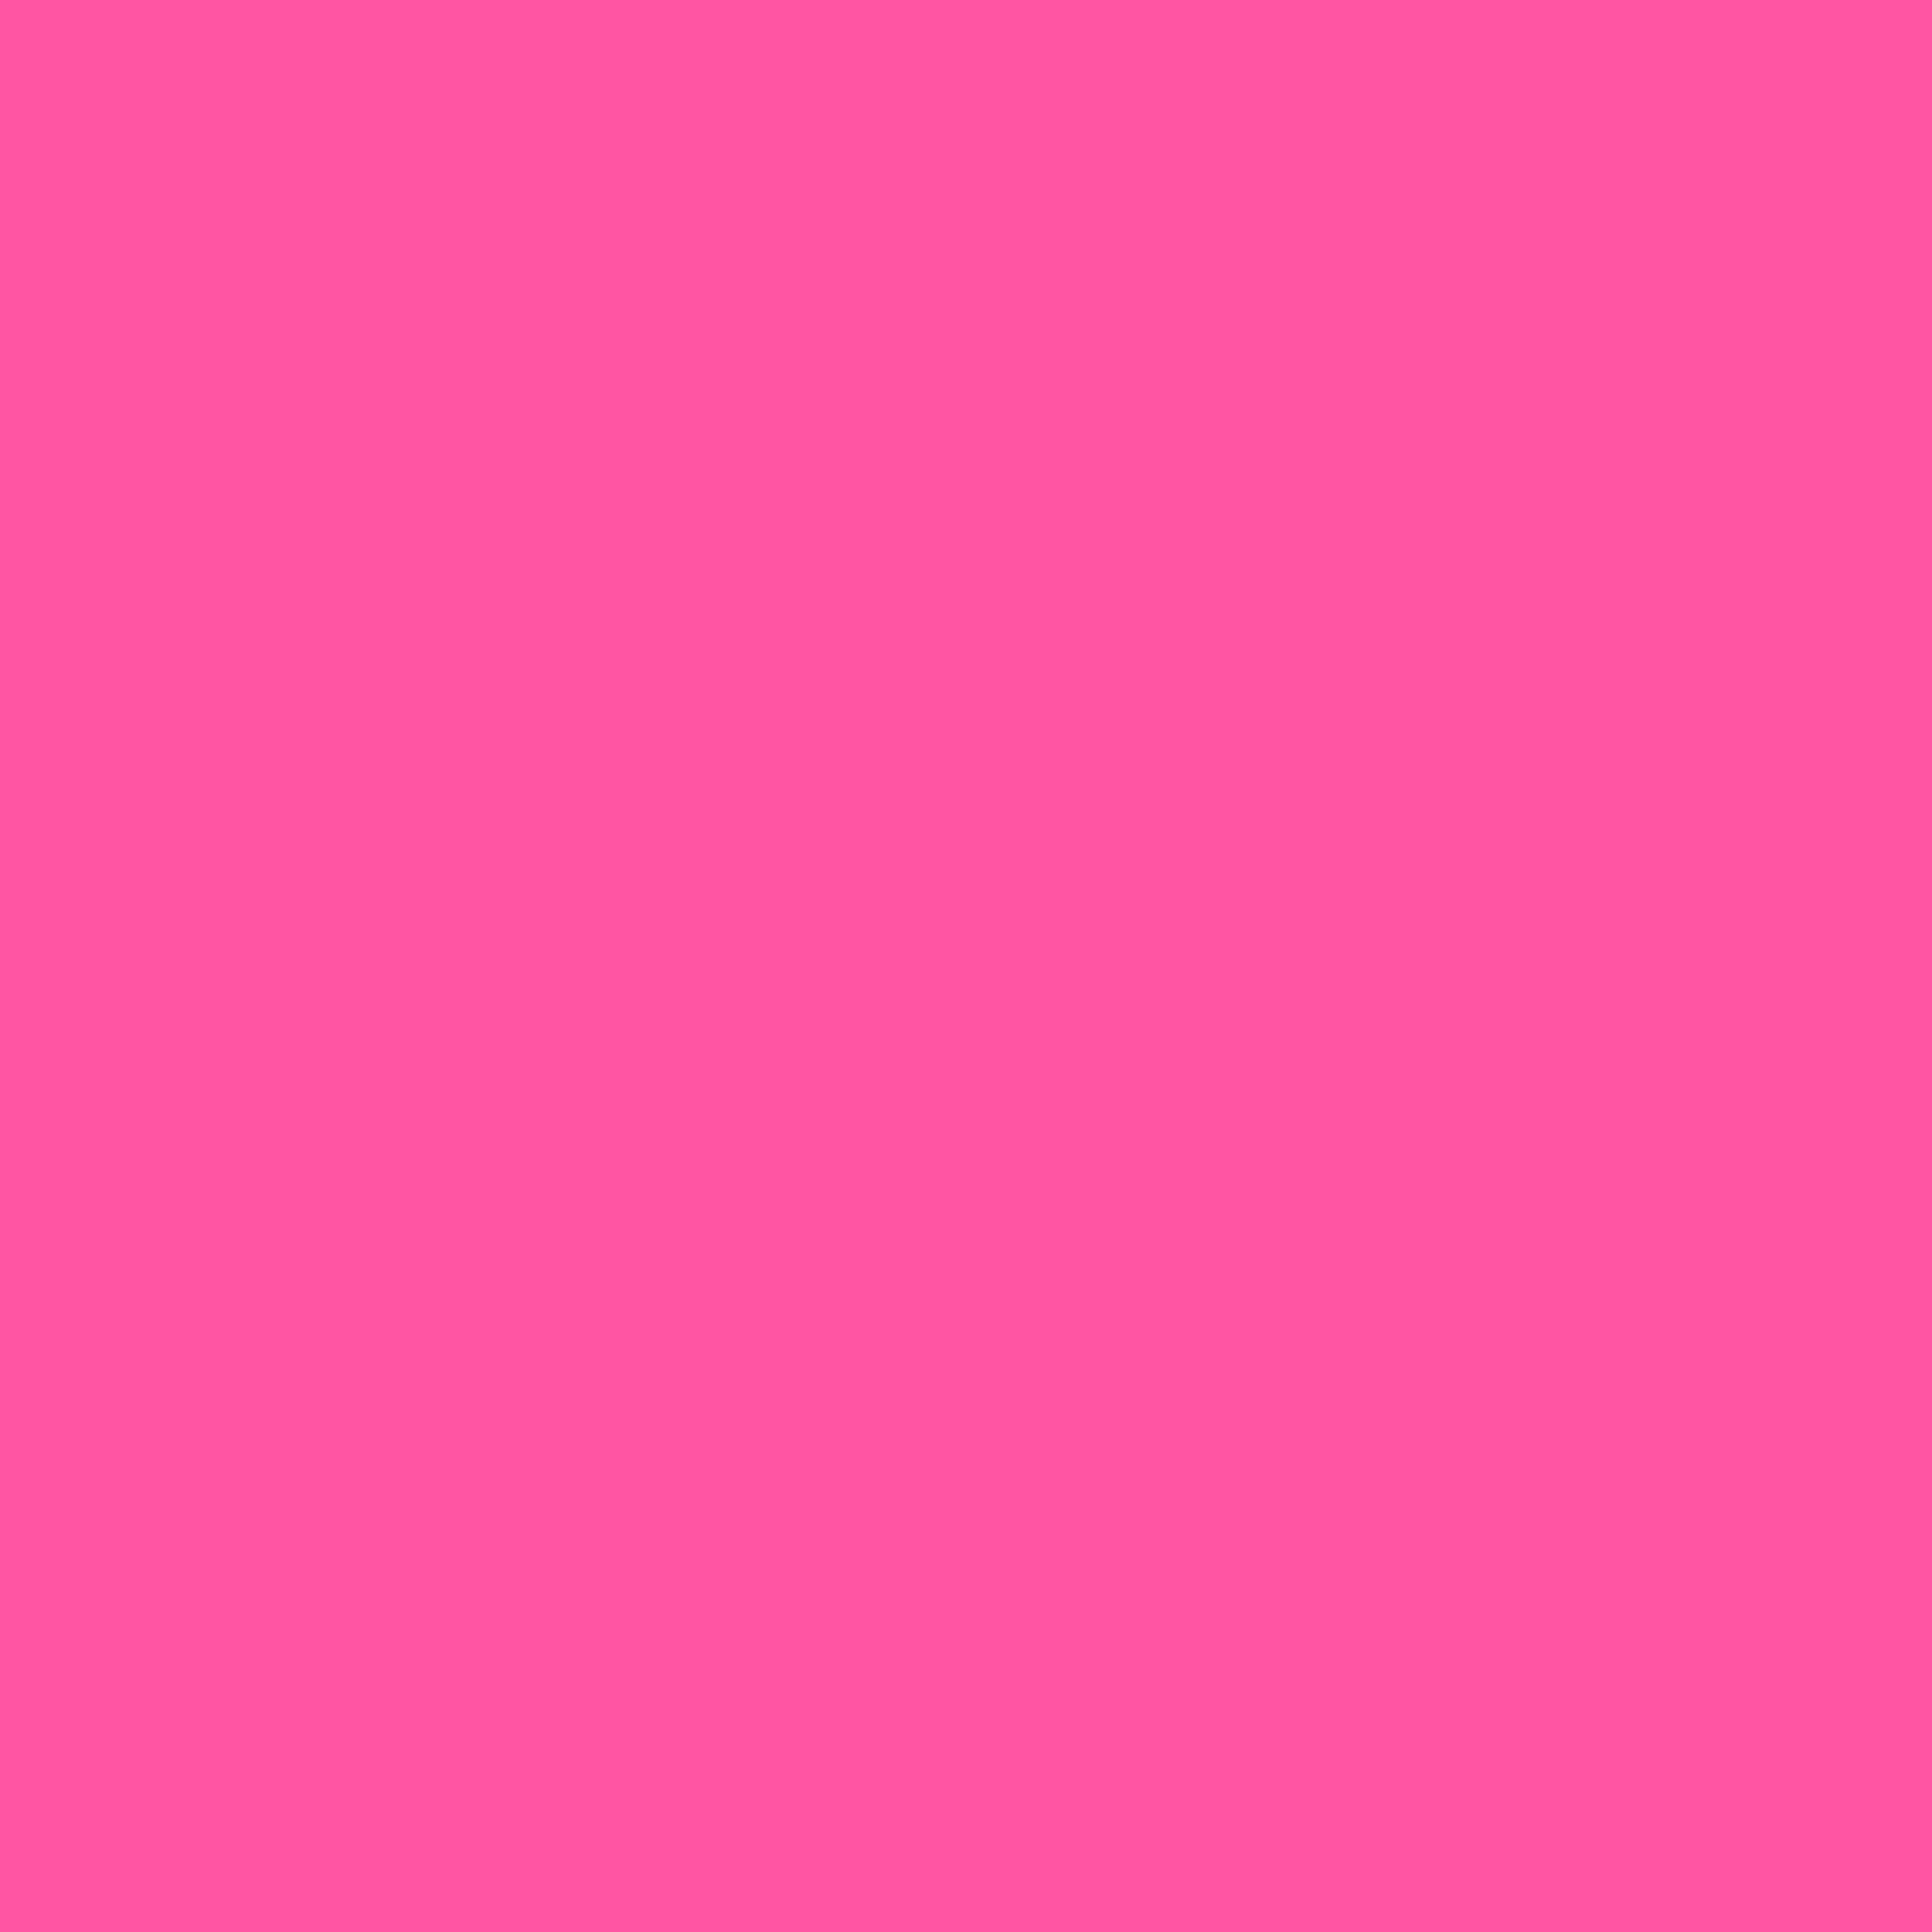 2732x2732 Brilliant Rose Solid Color Background